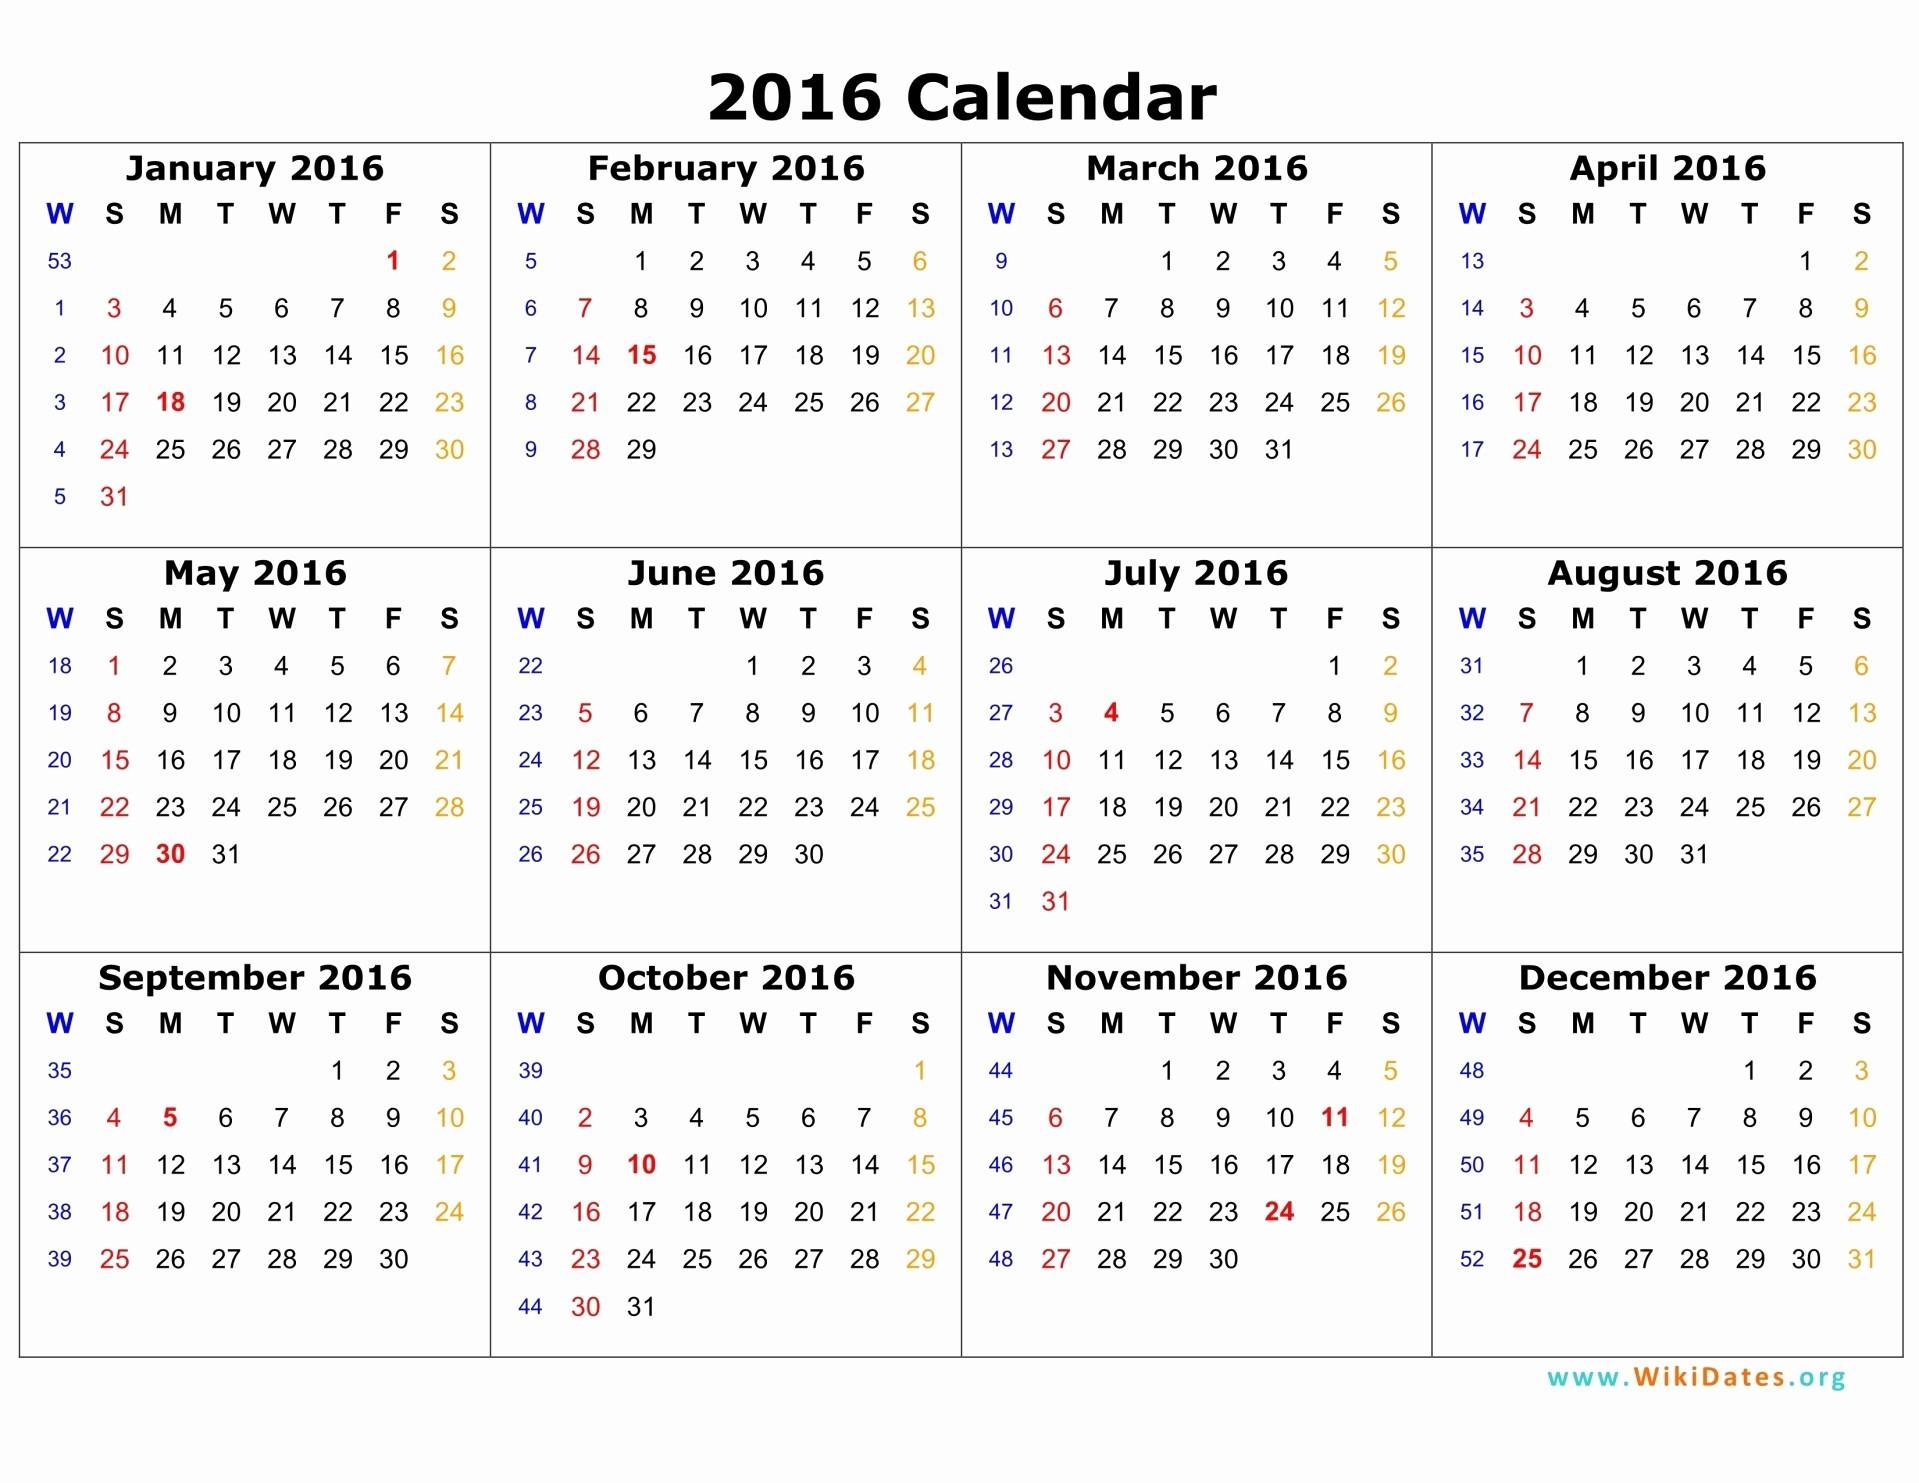 Free Printable Calendar 2016 Templates Lovely 2016 Calendar